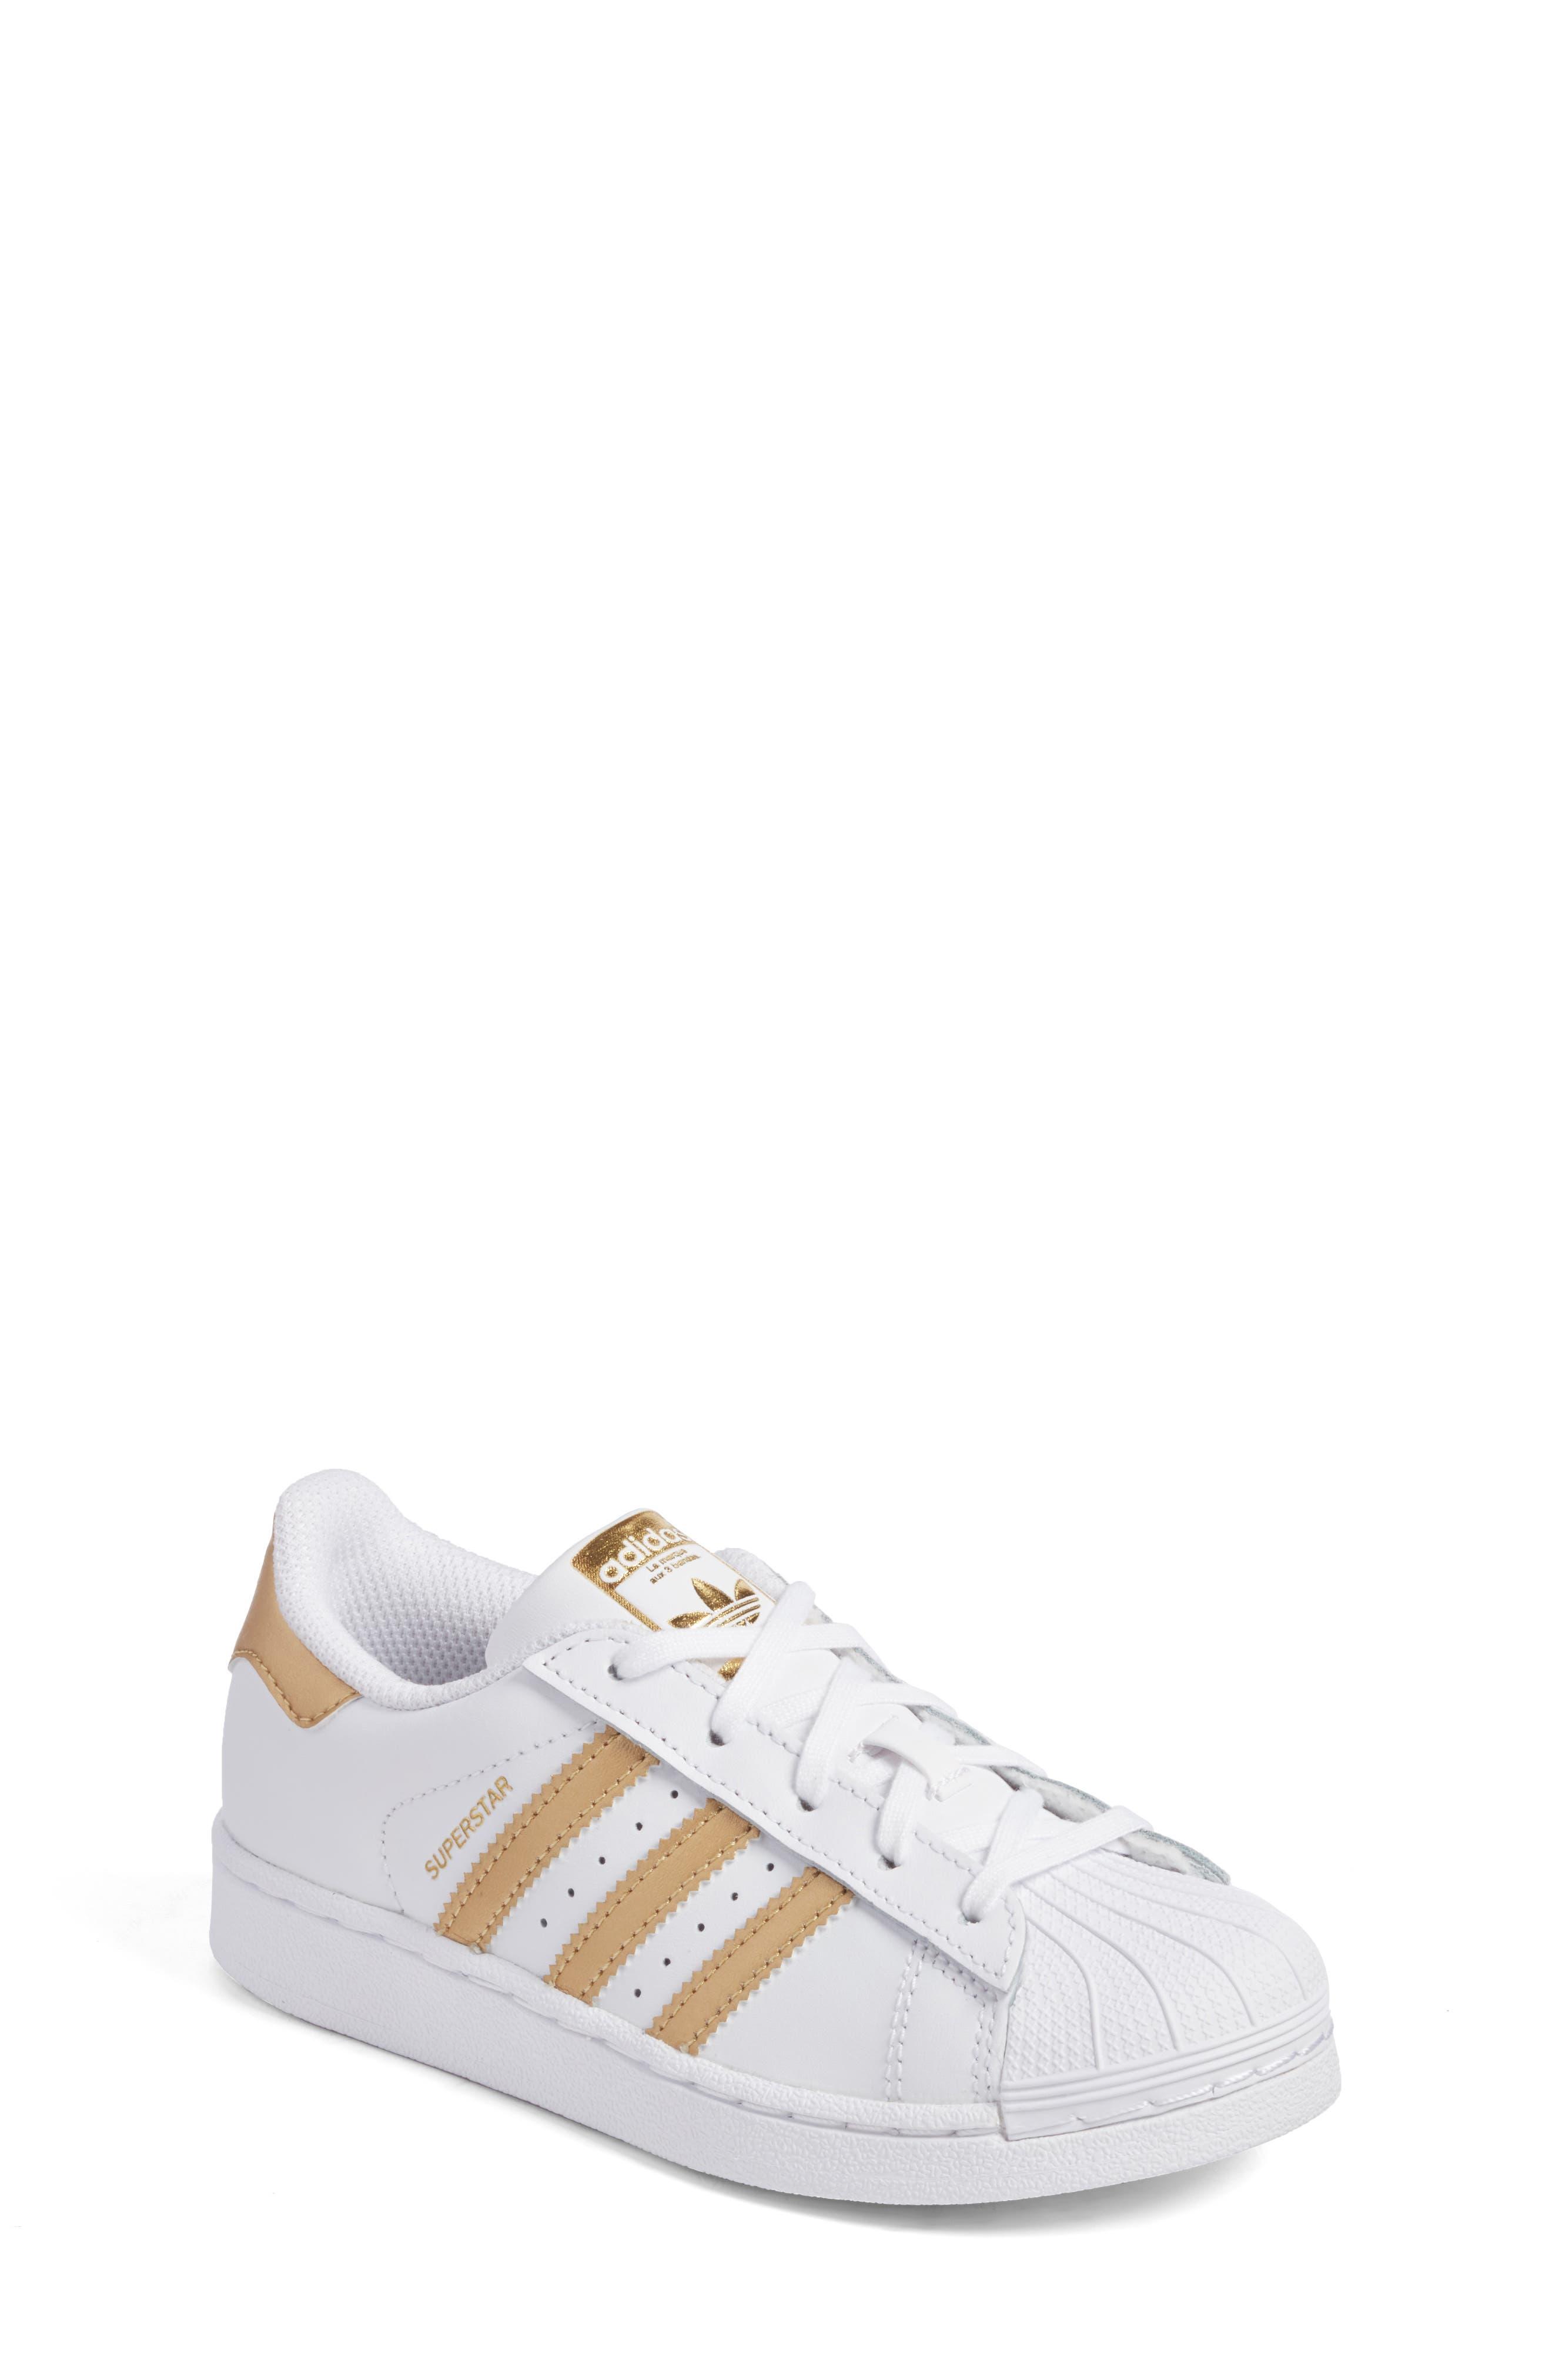 Superstar C Sneaker,                             Main thumbnail 1, color,                             100